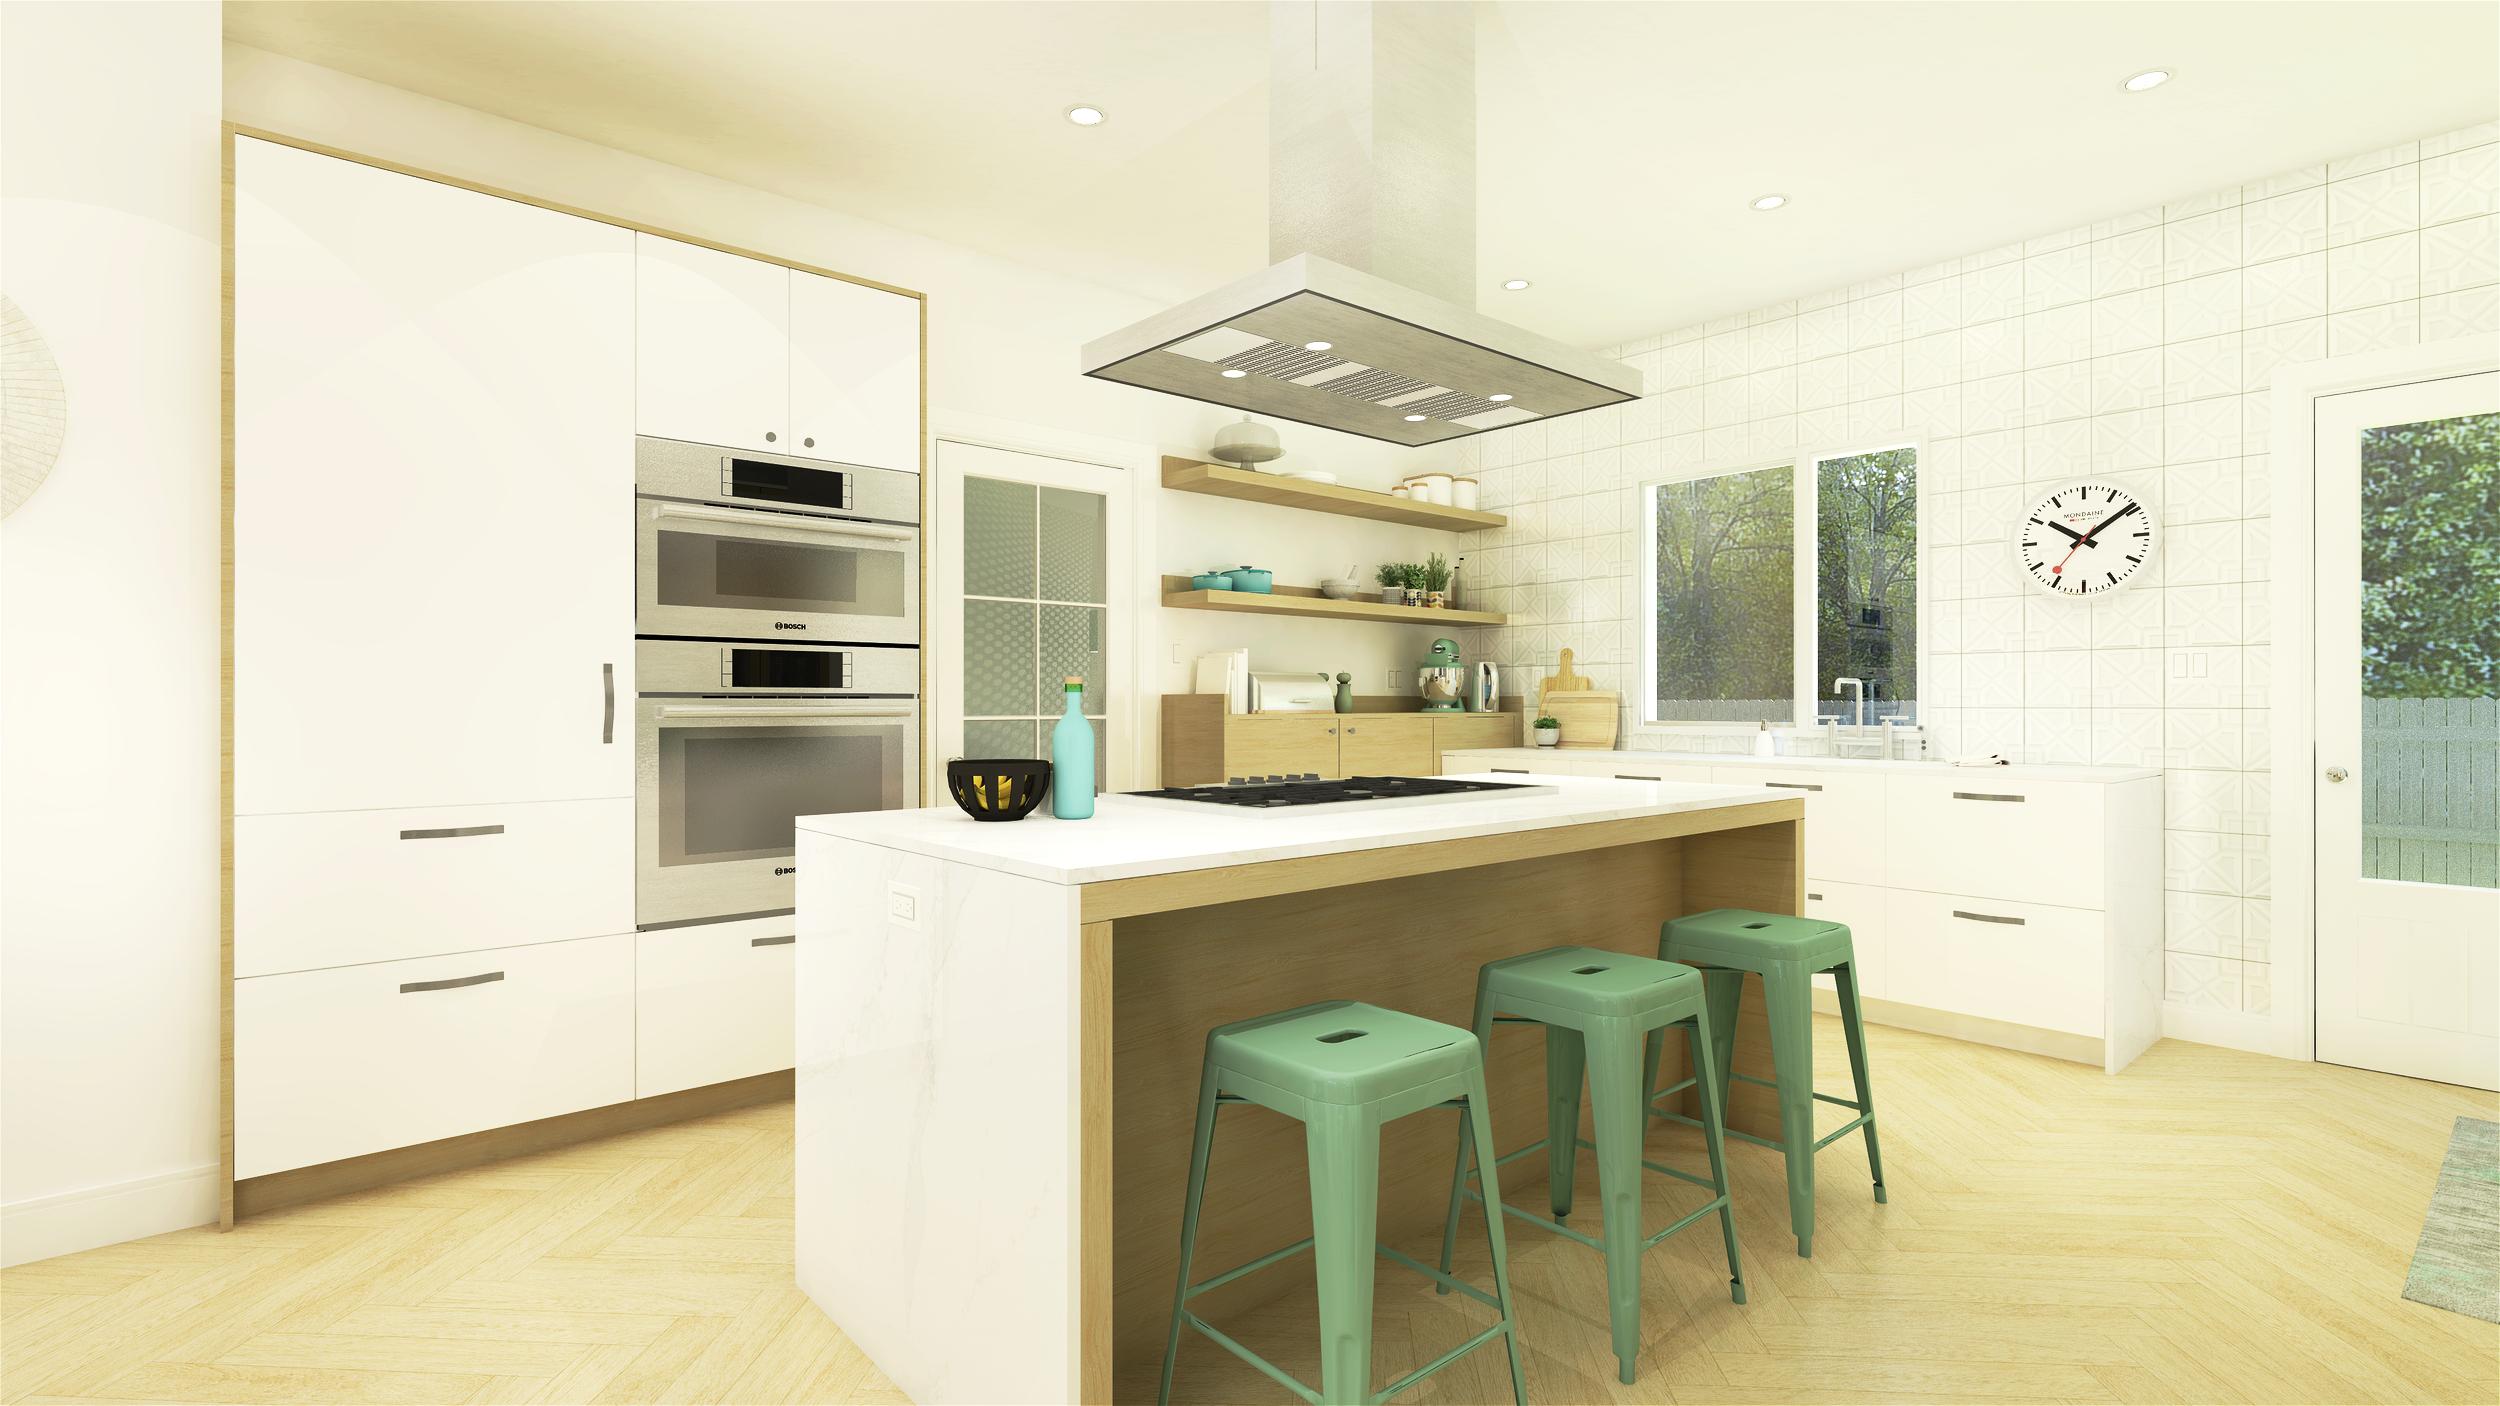 deSousaDESIGN_Kitchen_Modern_Suburbia_V1b_3840x2160.png